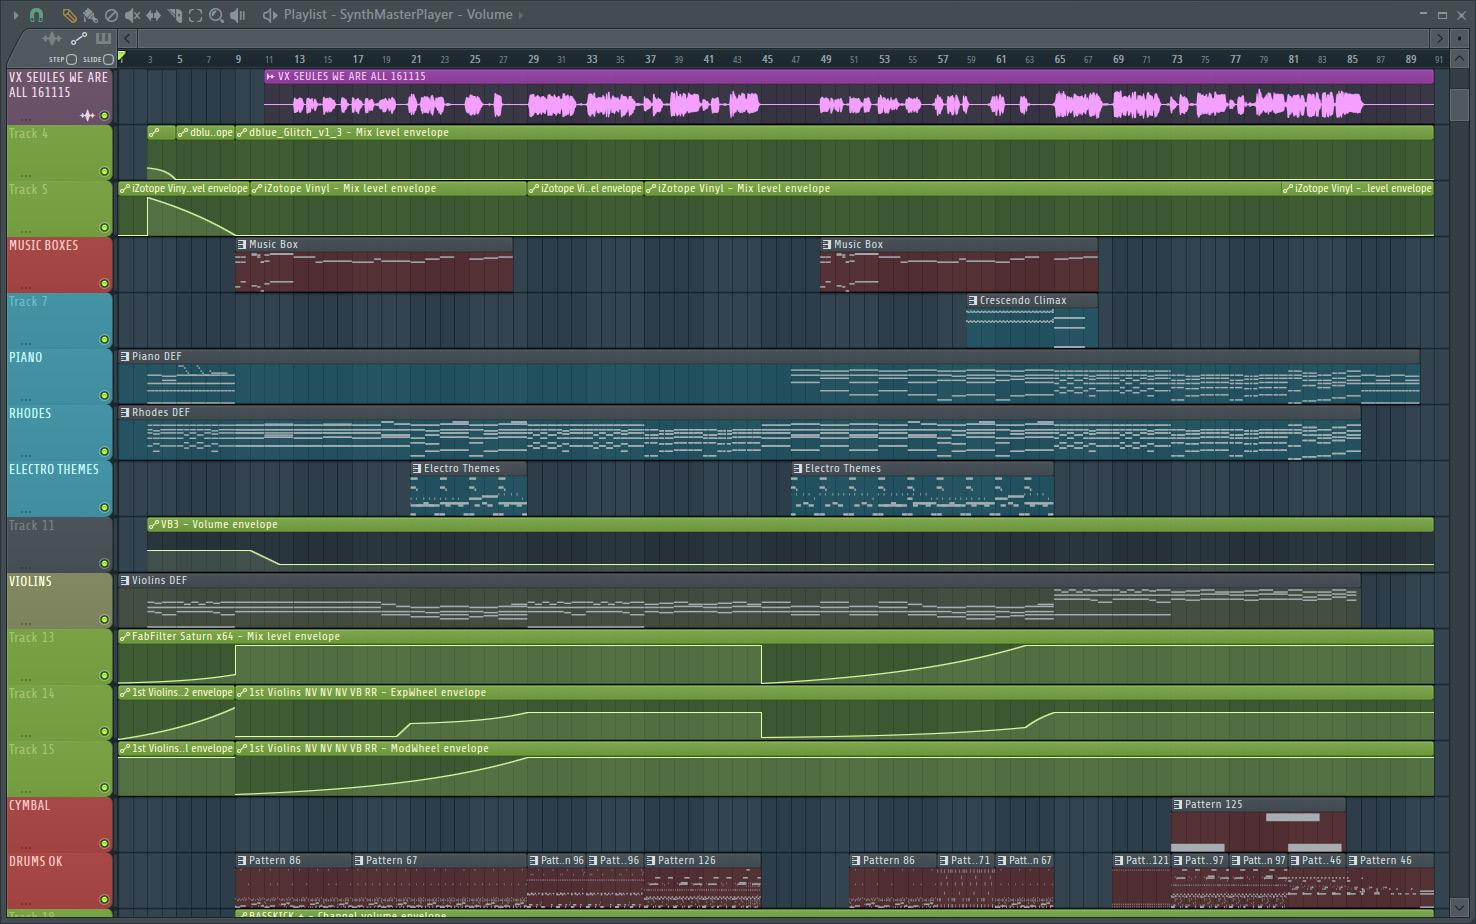 Fl Studio 12 - Playlist